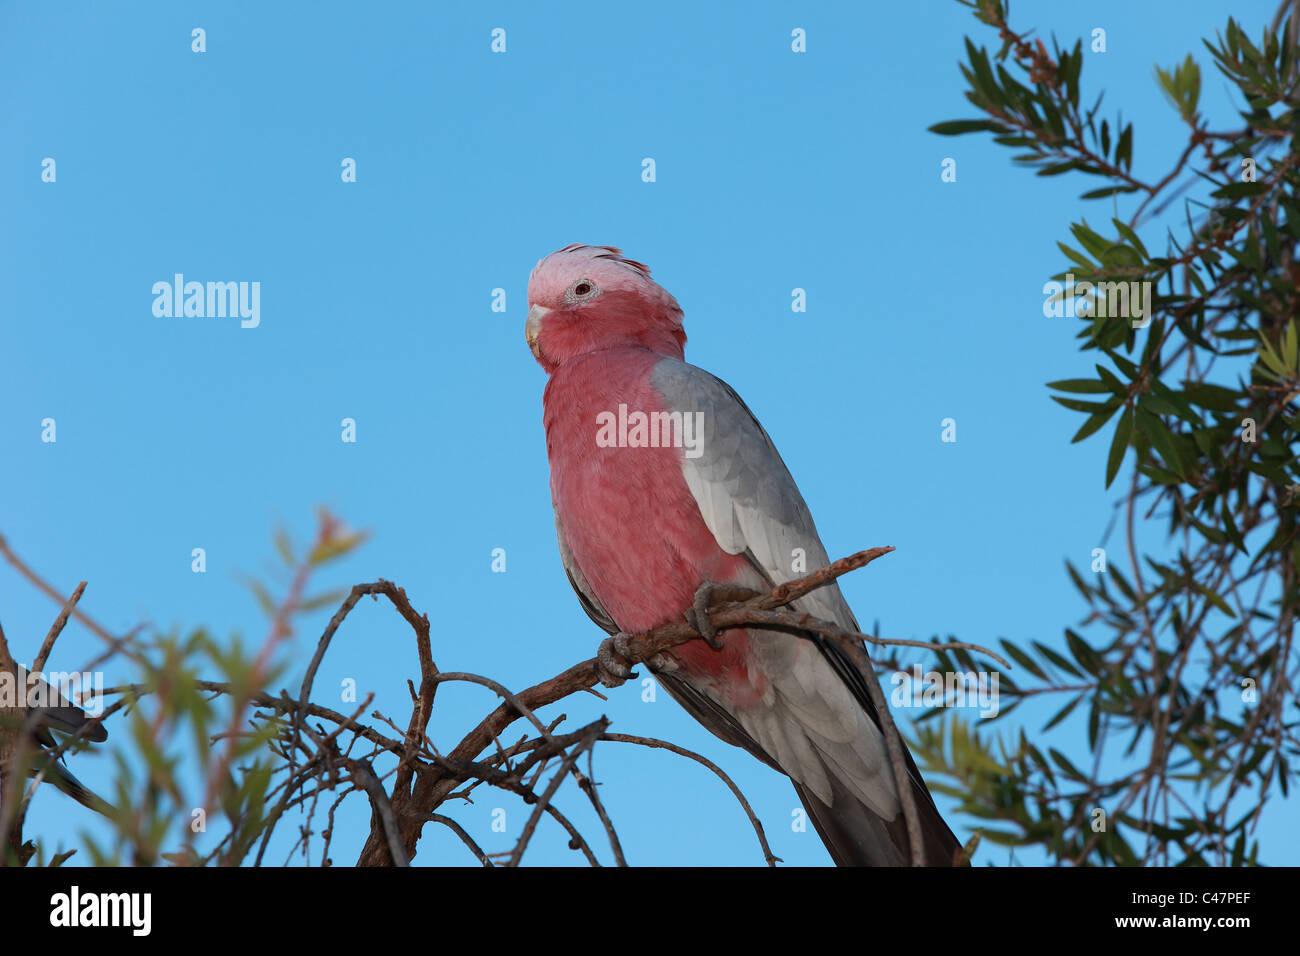 Australian Galah sitting in a tree, Cacatua roseicapilla  native only to Australia - Stock Image